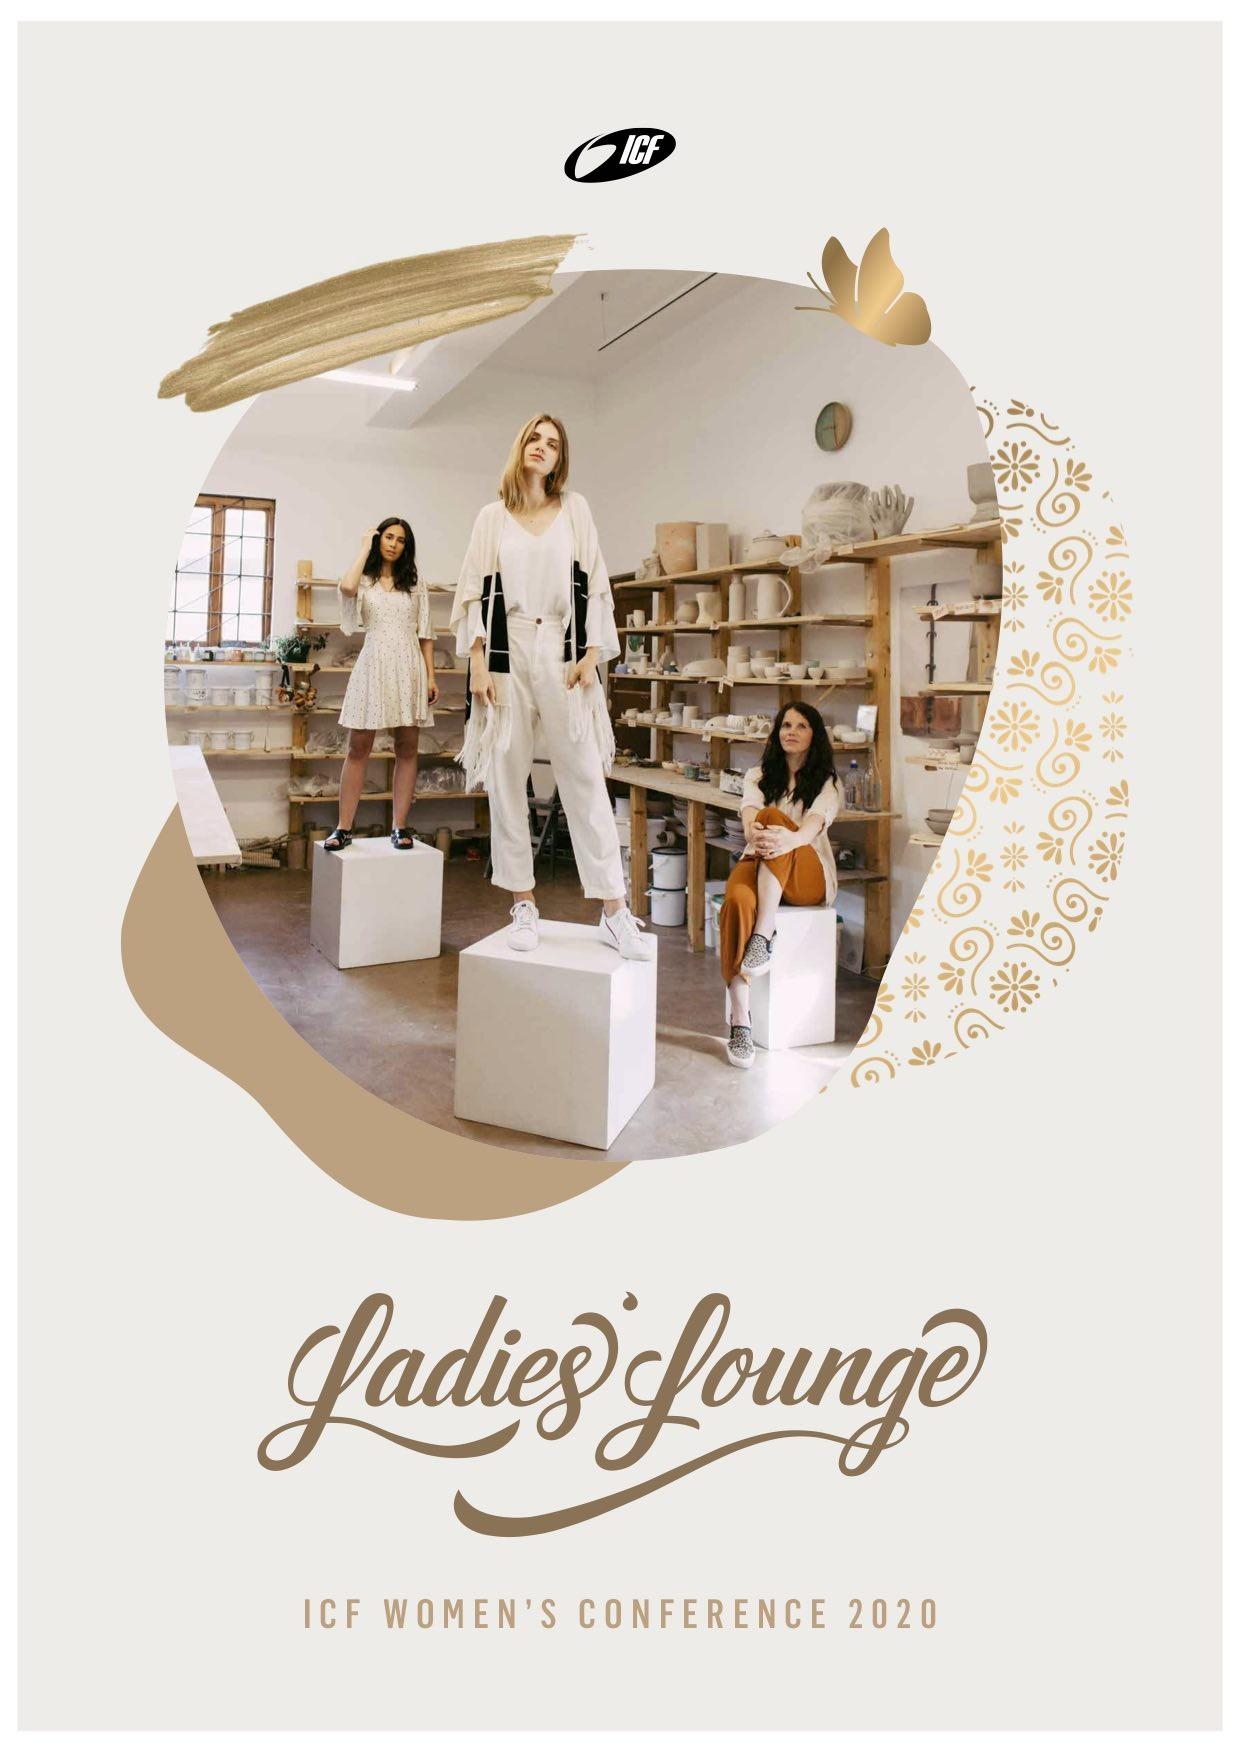 ICF Ladies Lounge 2020 - go further! in Zürich